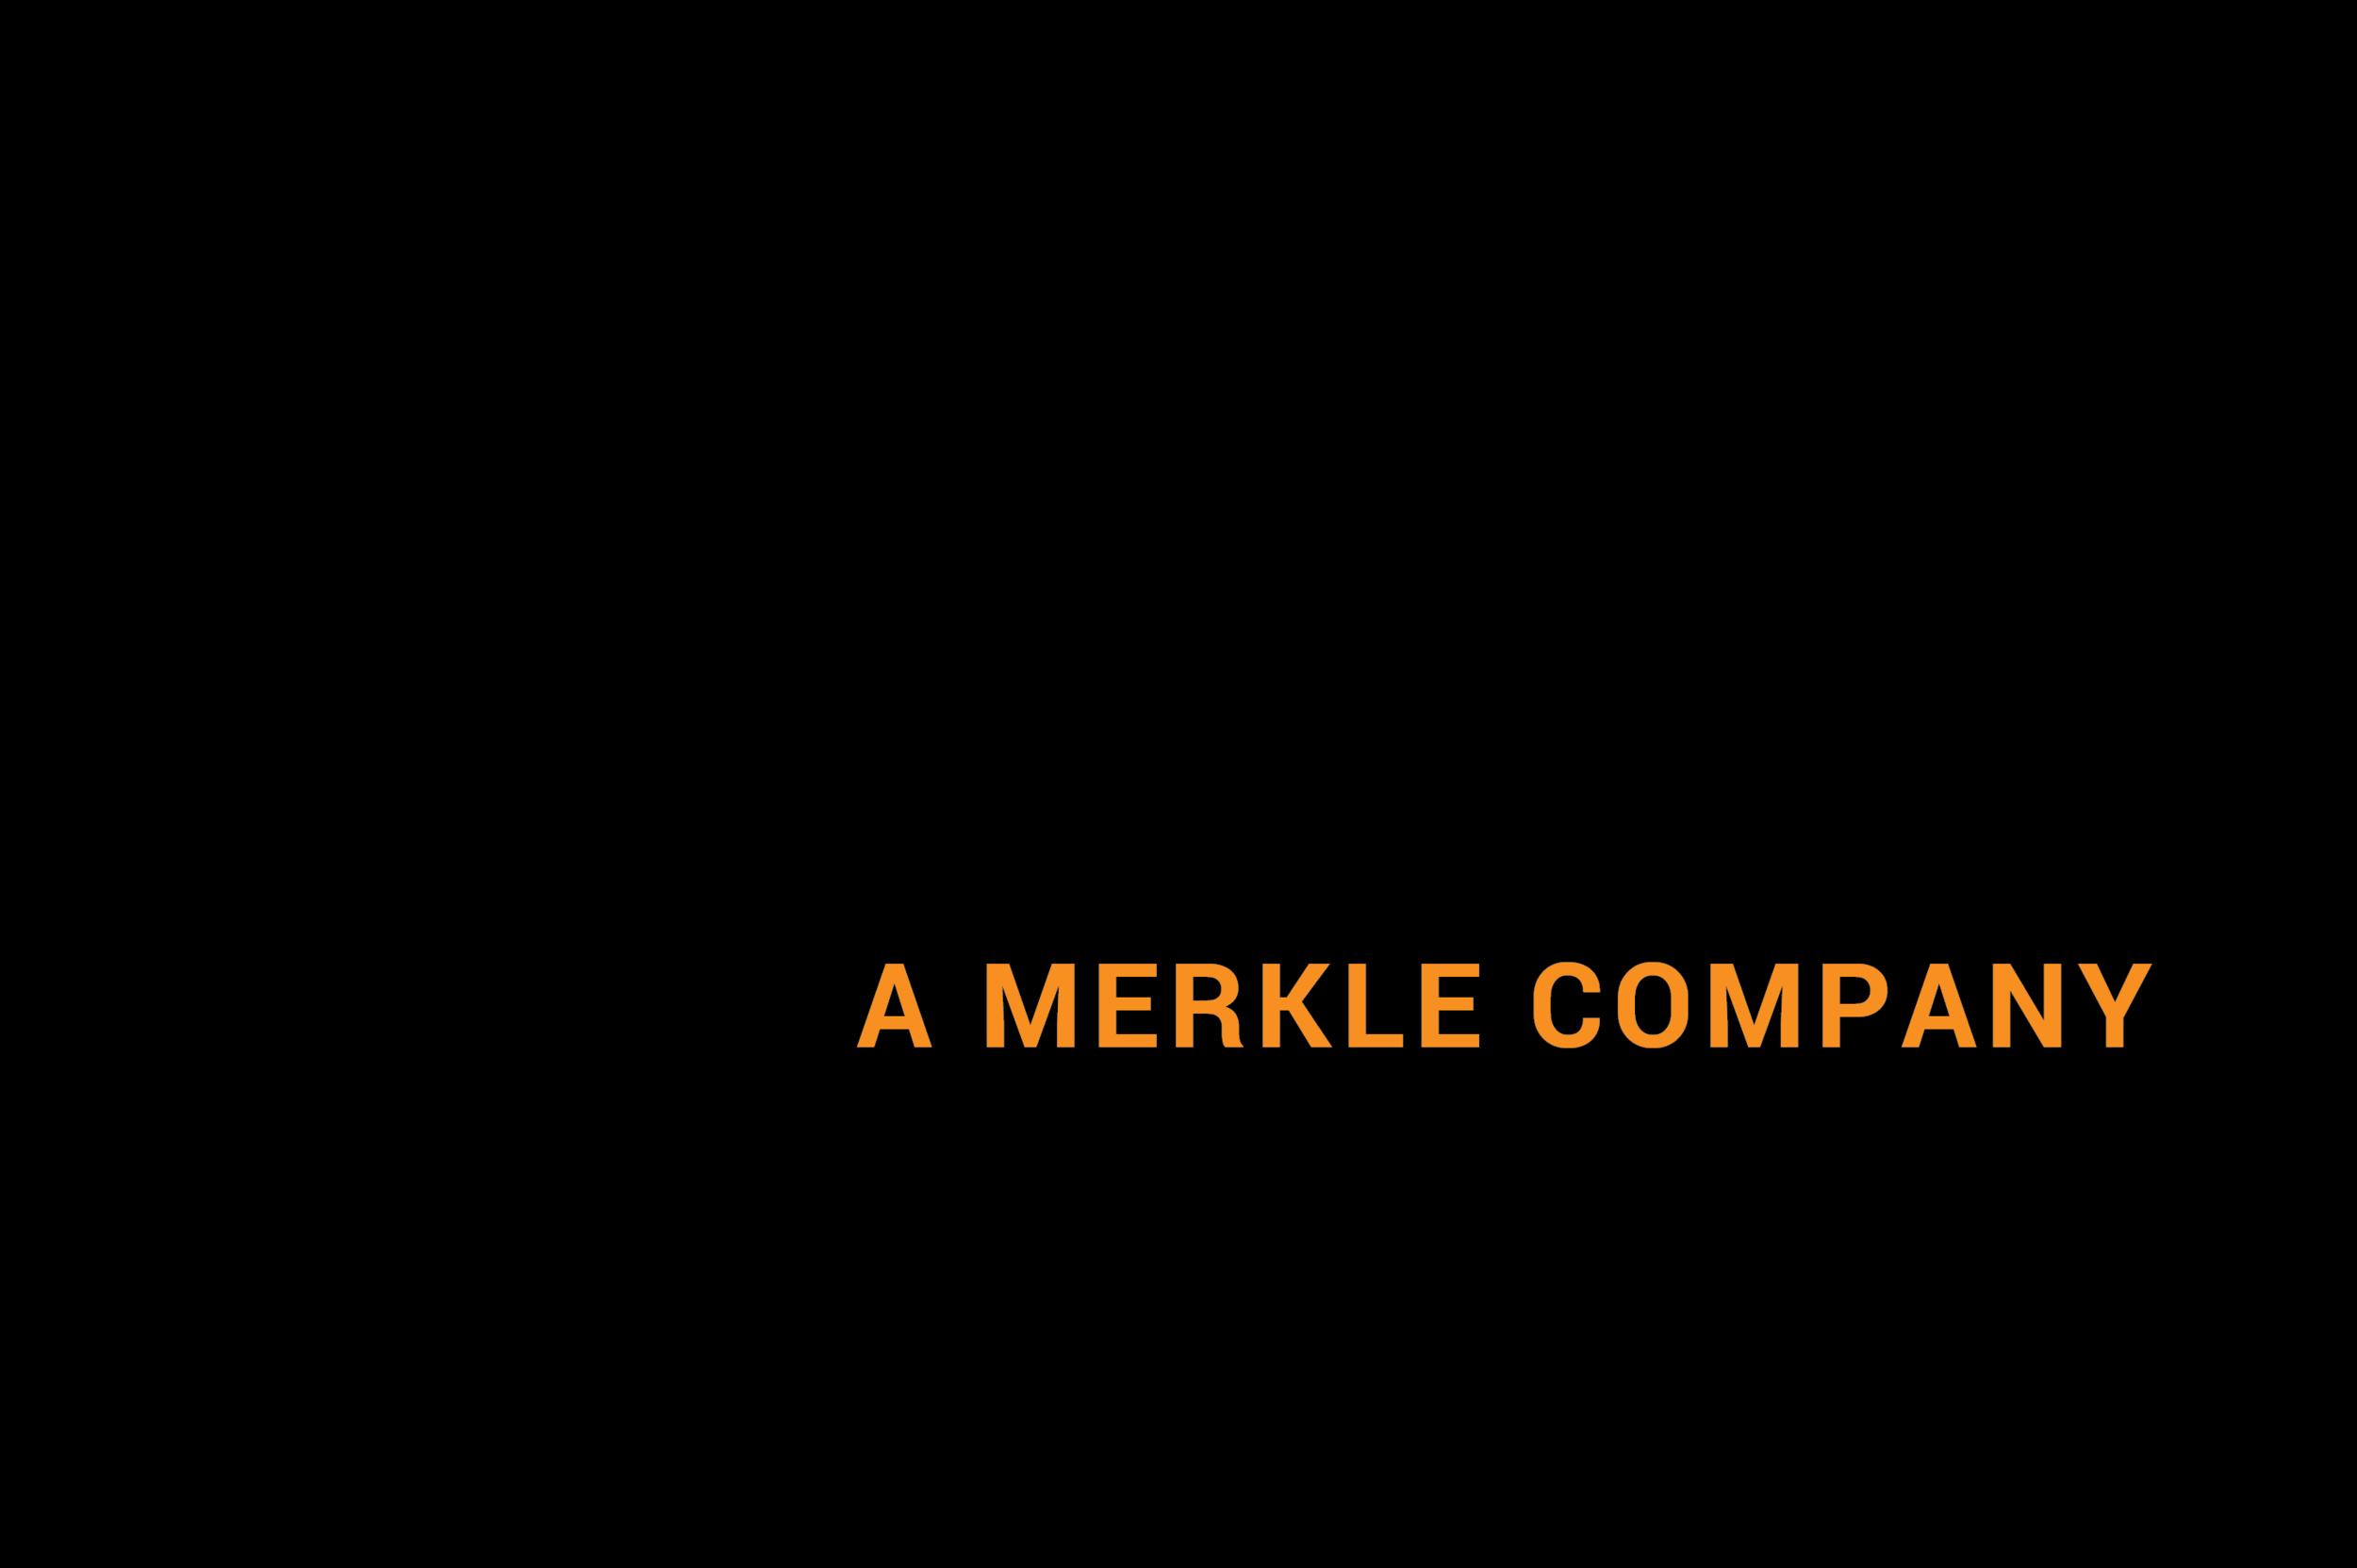 COMET_Black&Orange.png